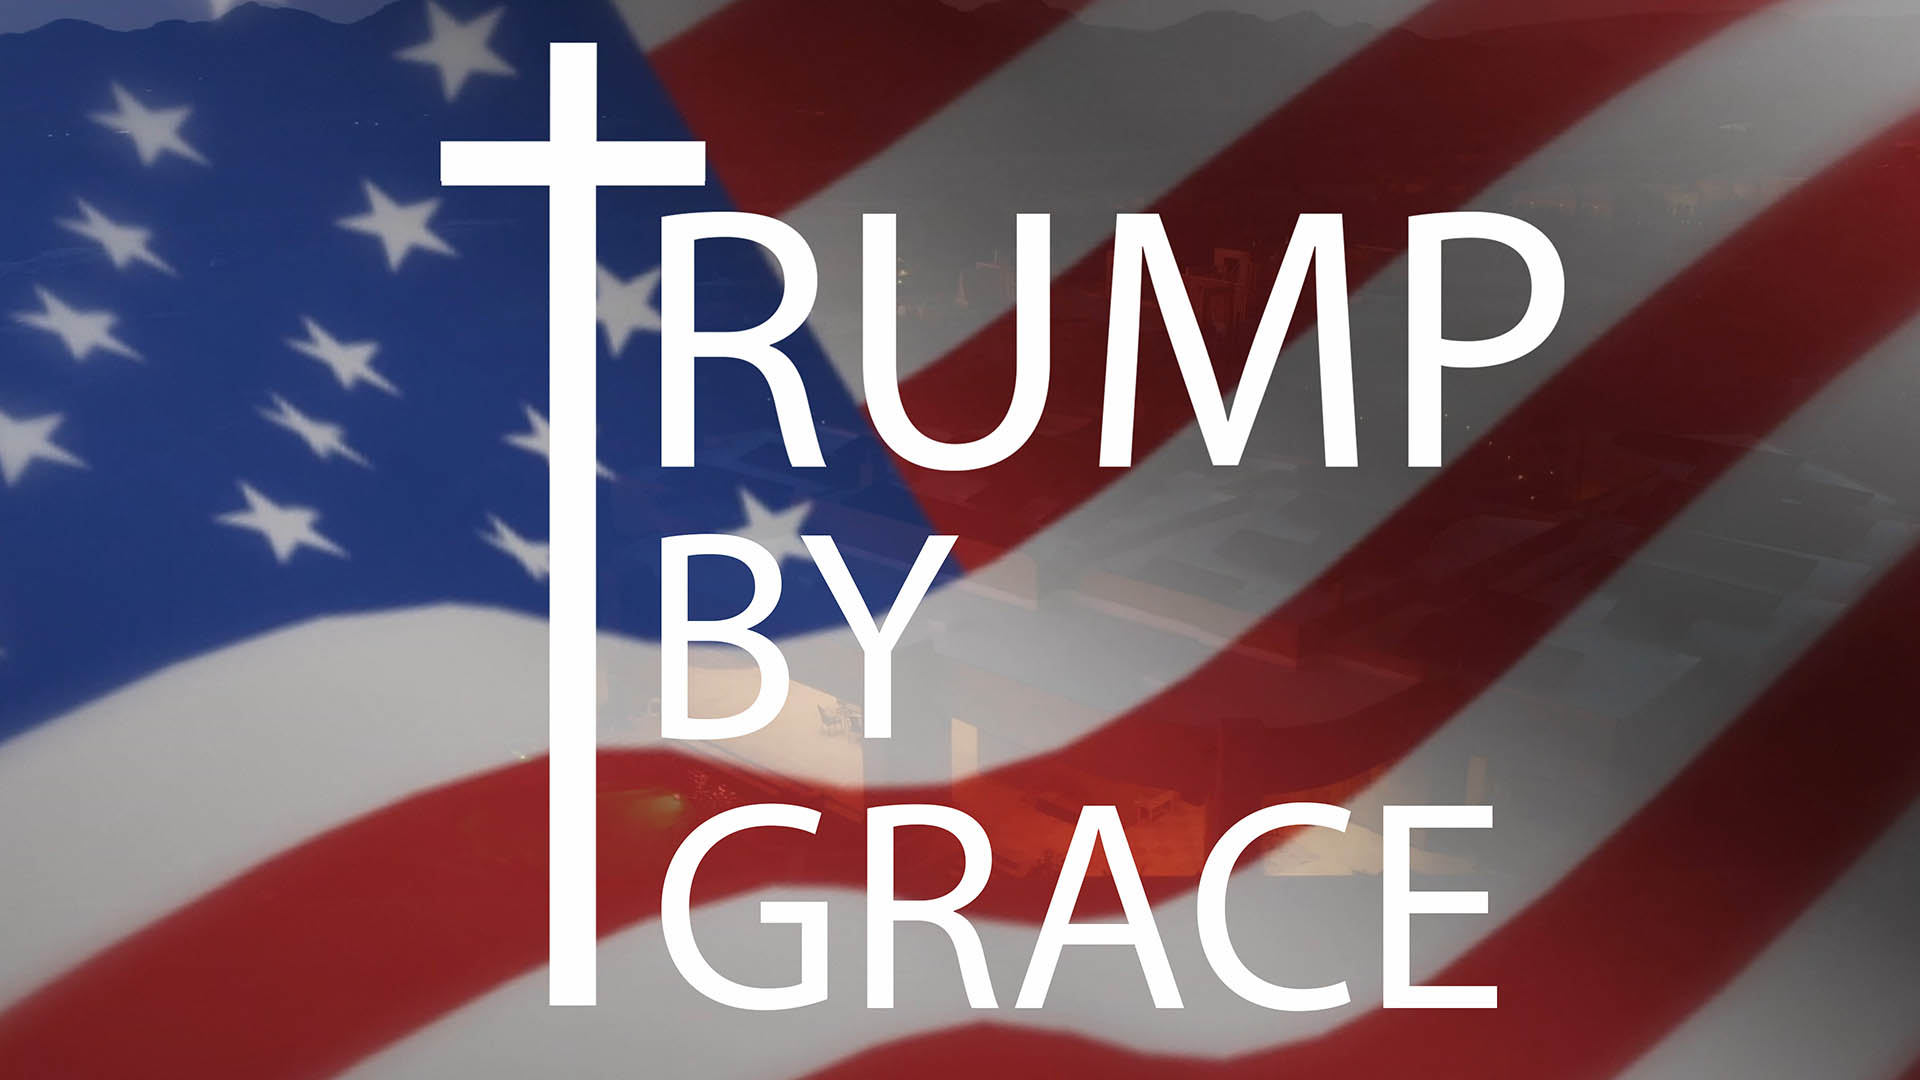 Trump By Grace